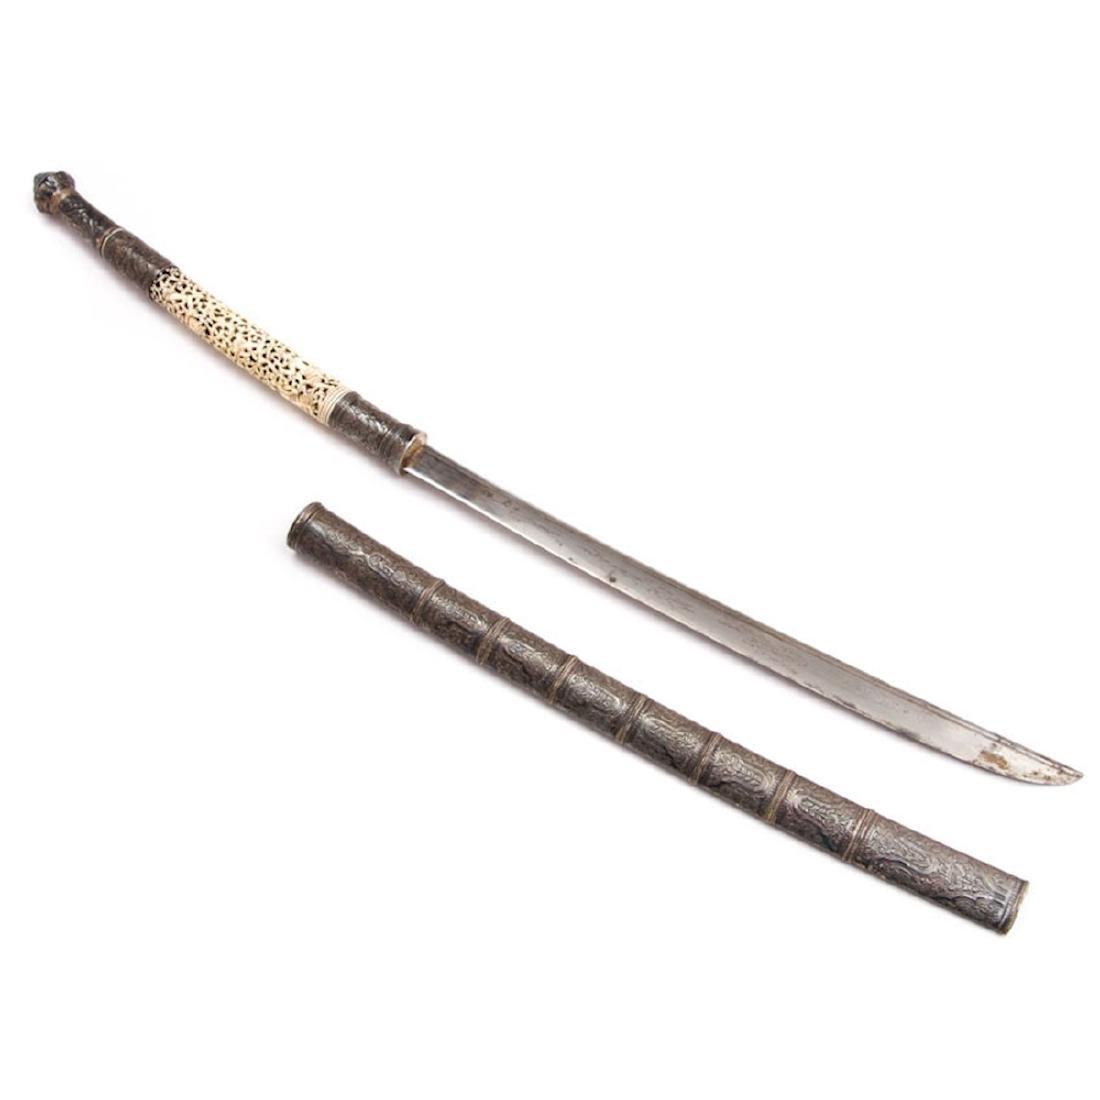 SILVER MOUNTED DHA SWORD, 19TH C.